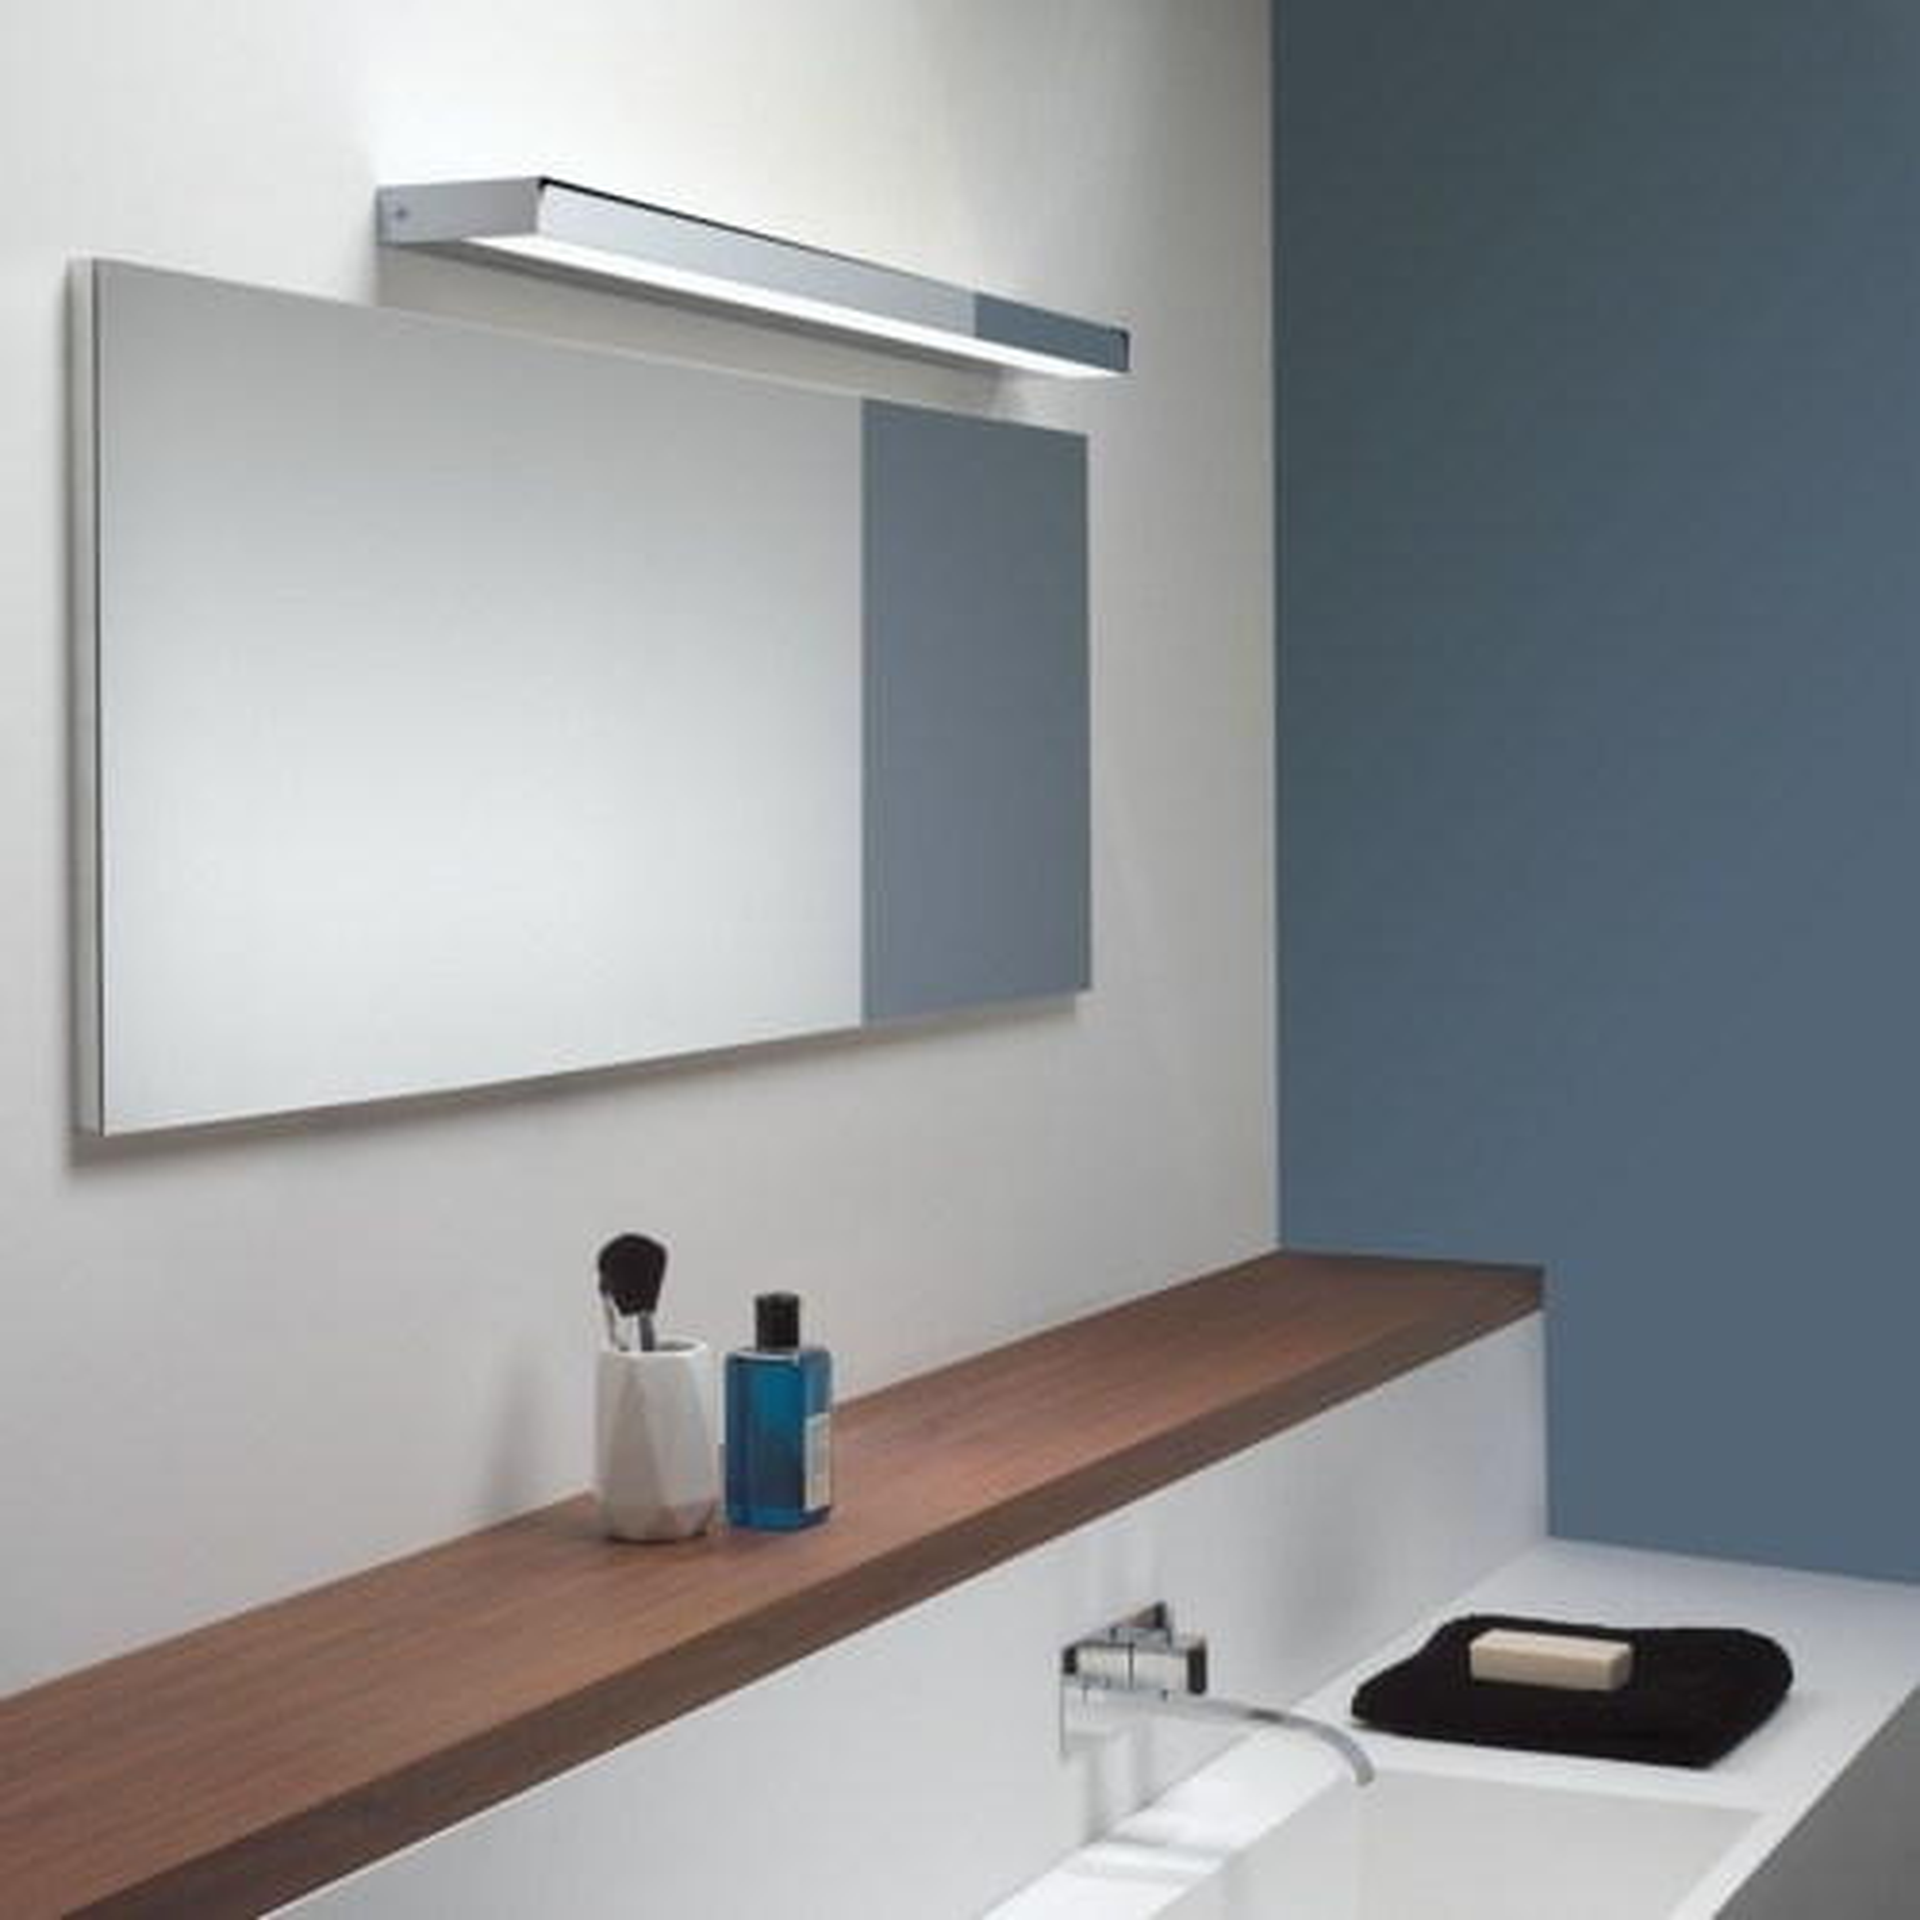 Axios | Badezimmer-Wandleuchte | LED | 600mm